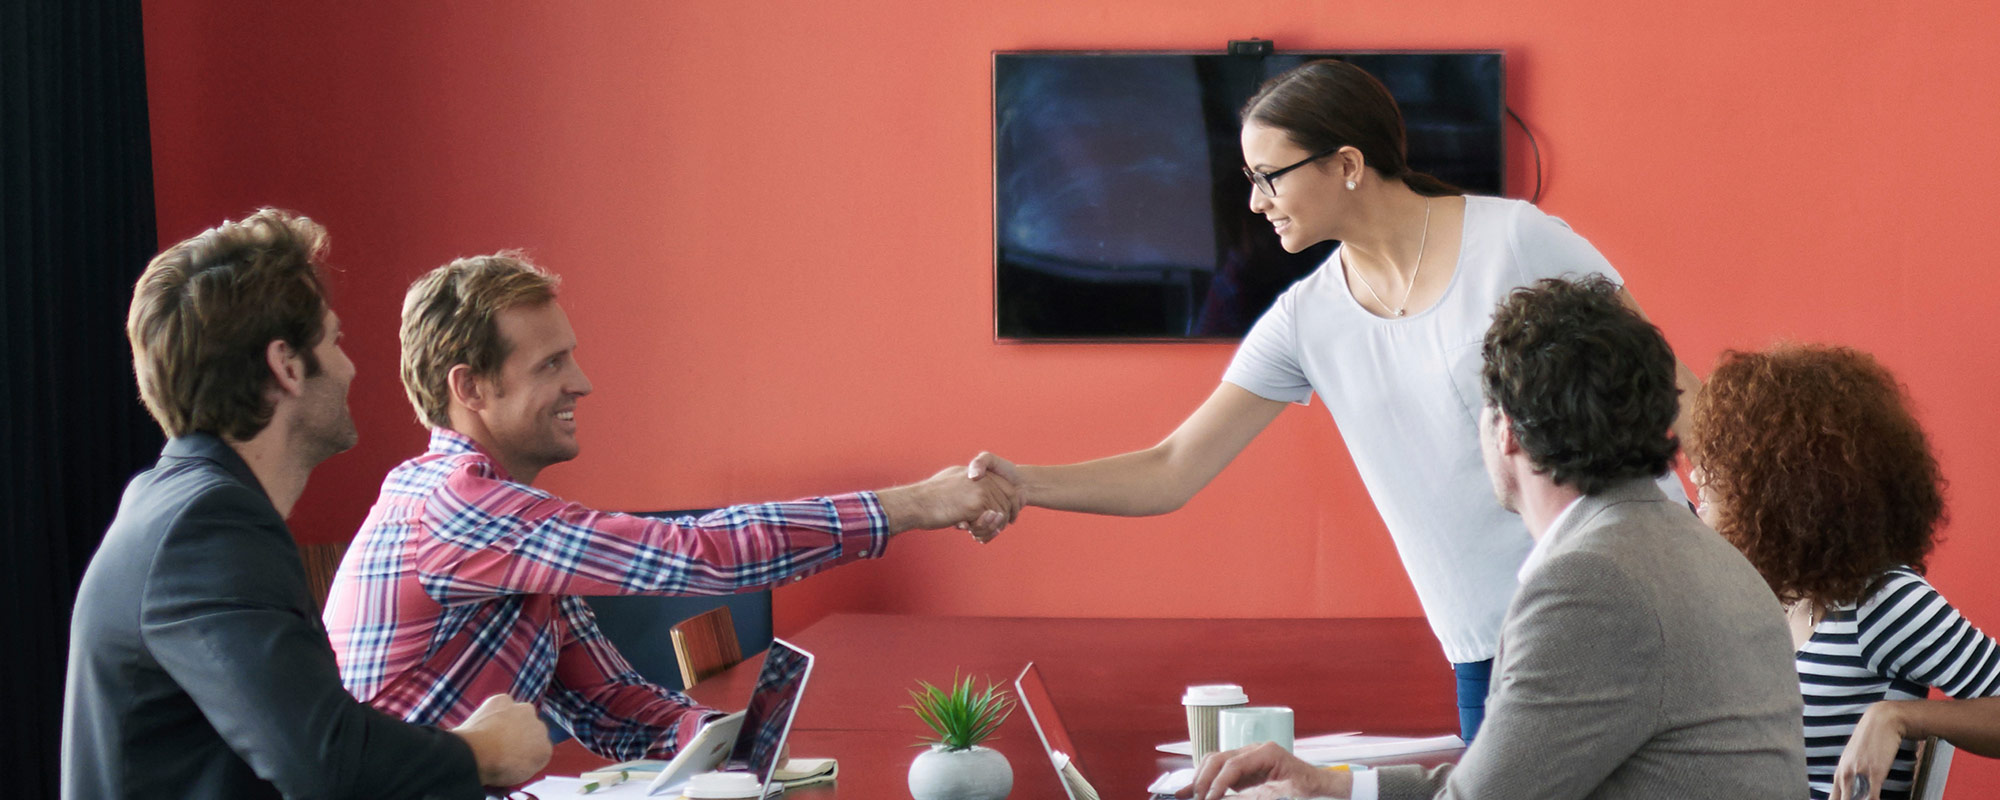 Innasol Sales Team Welcome New Employee